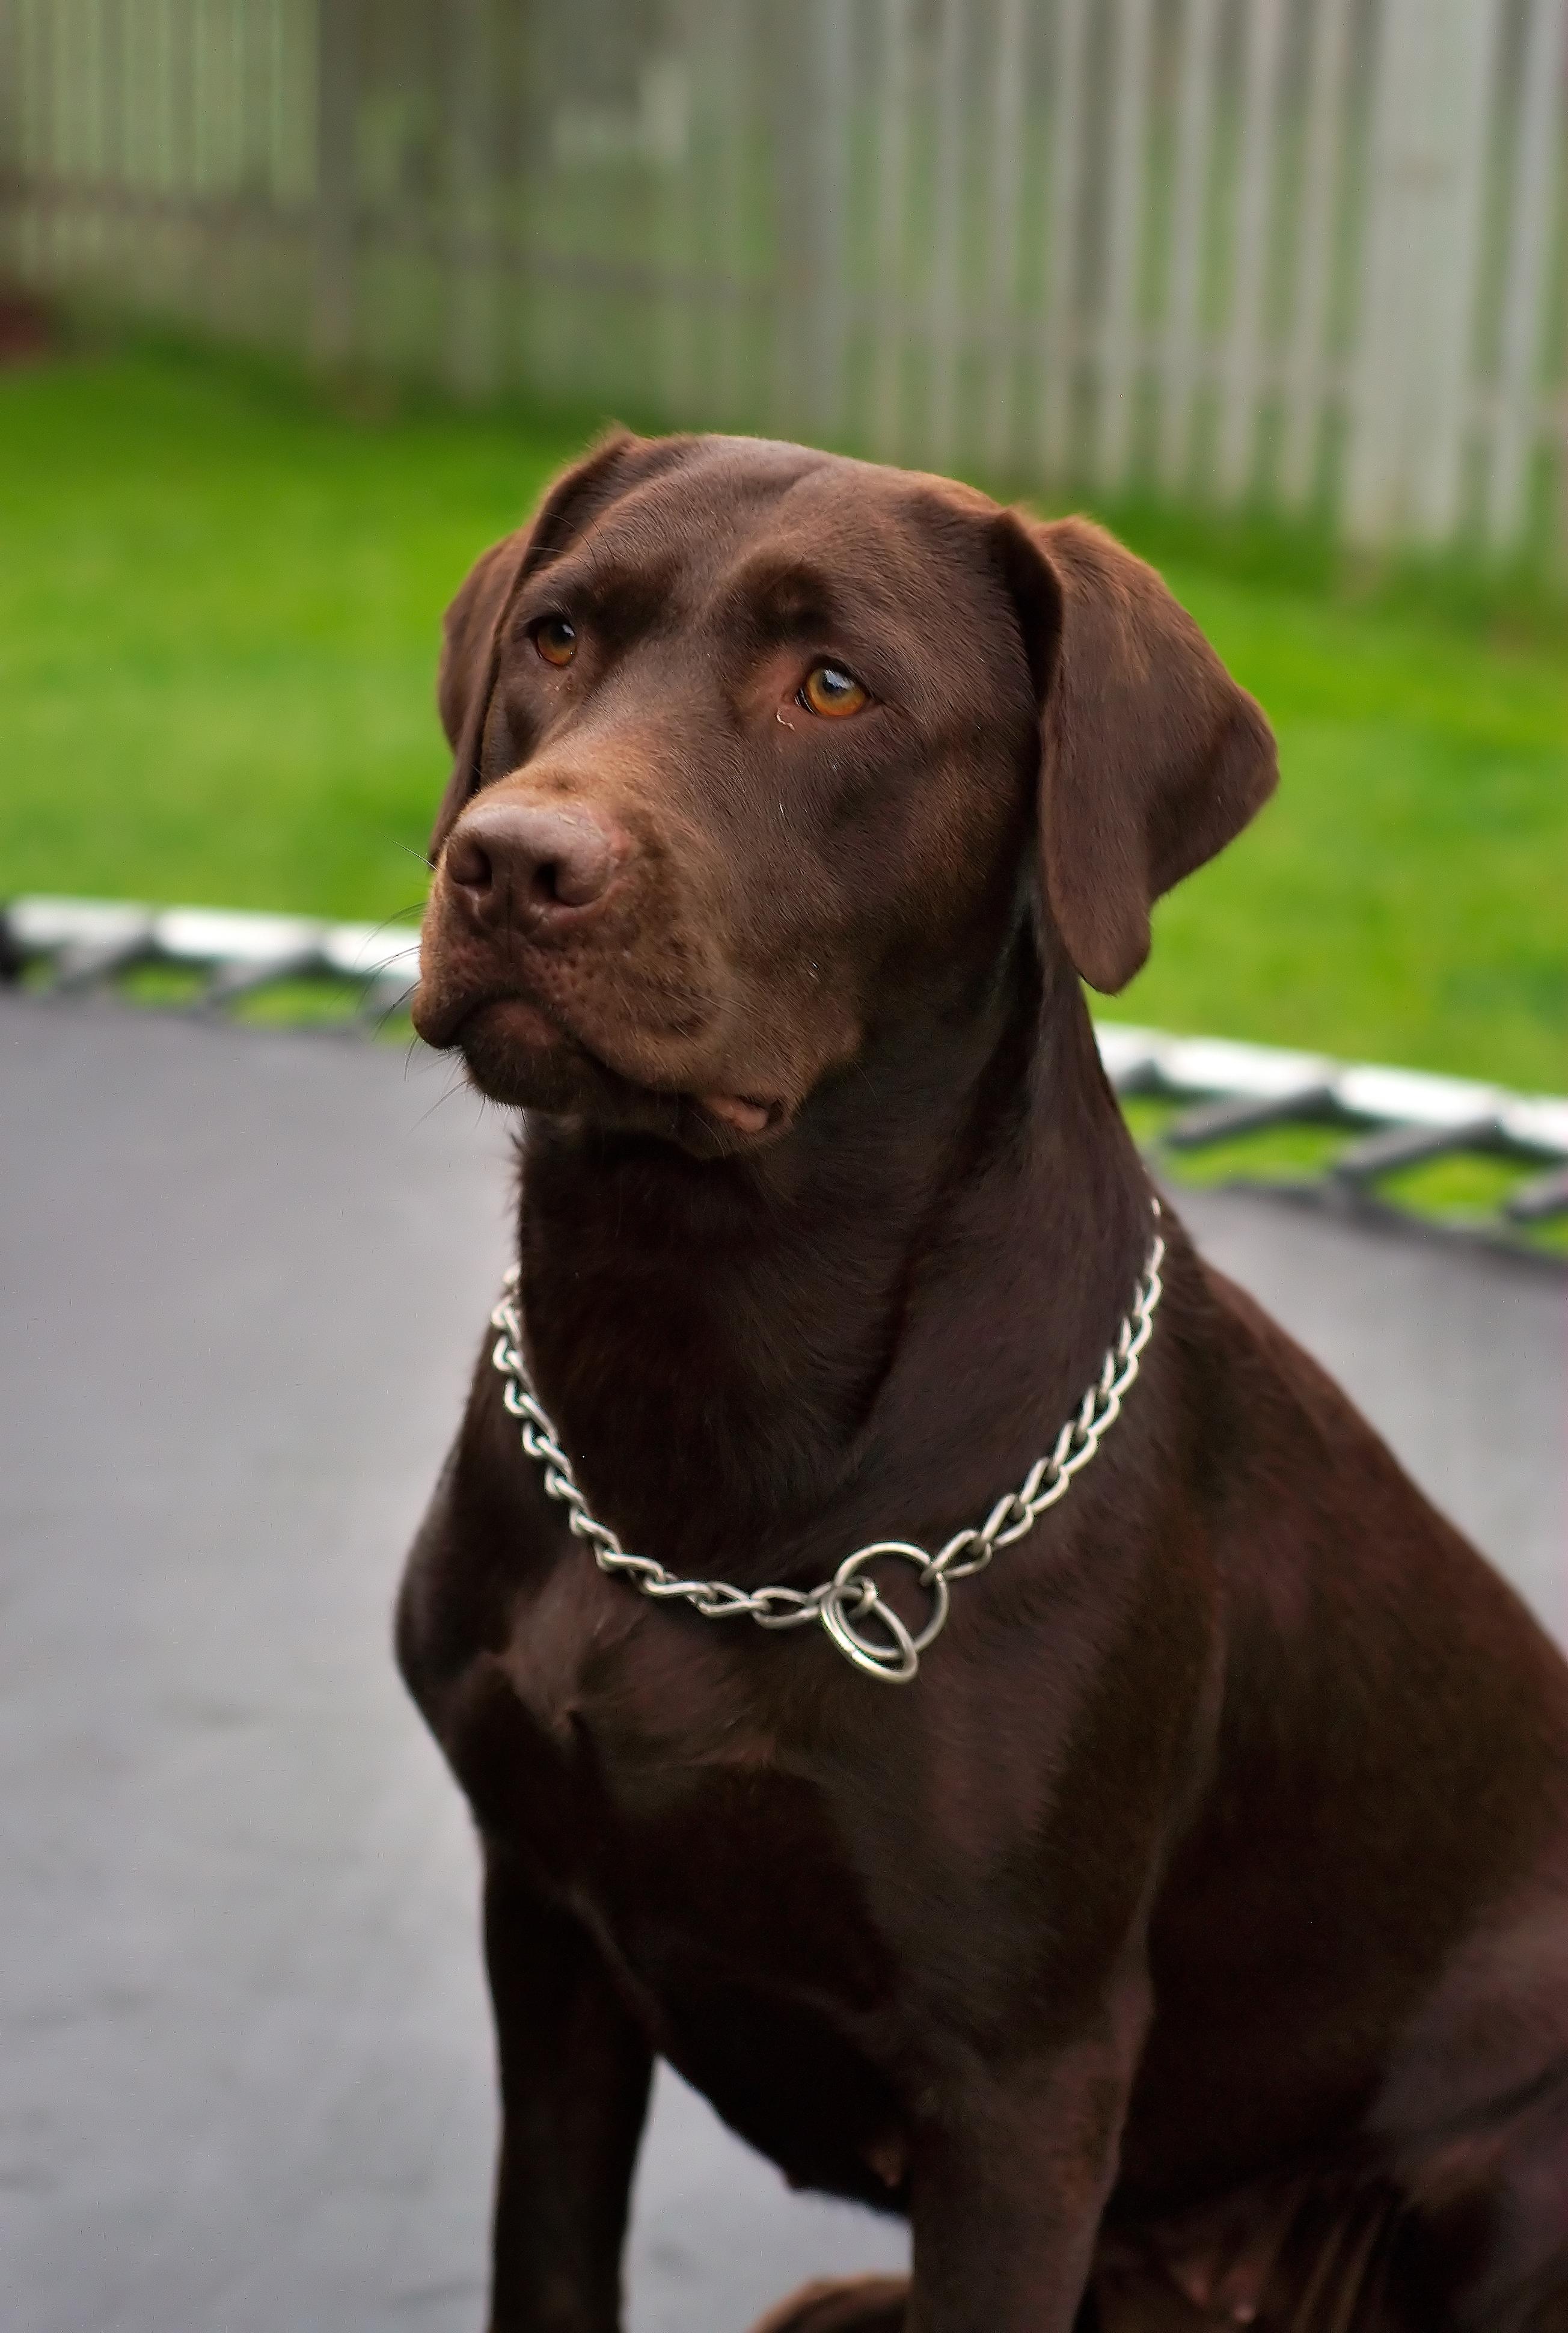 File:Labrador Retriever chocolate Hershey sit.jpg - Wikimedia Commons